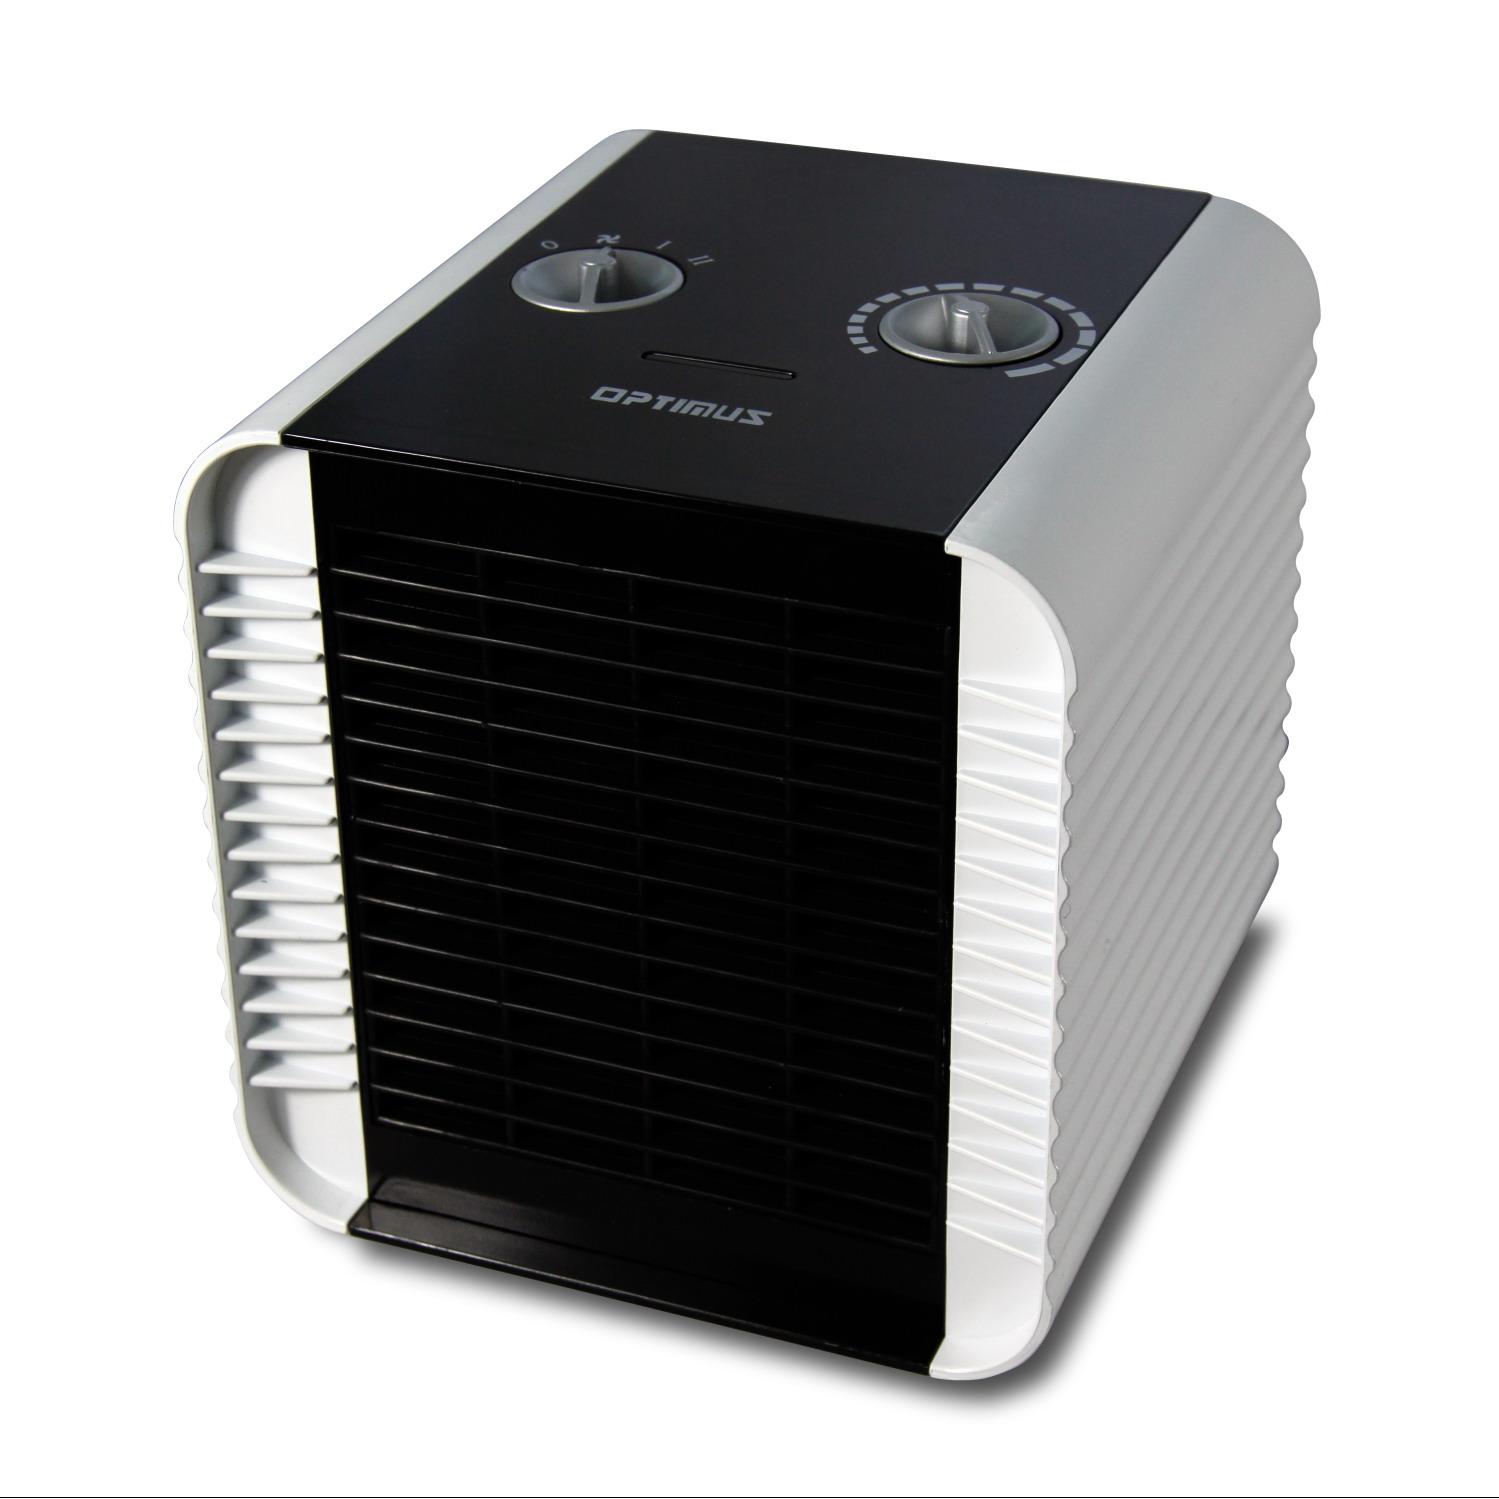 Optimus H7003 Heater Ceramic With Thermostat Portable